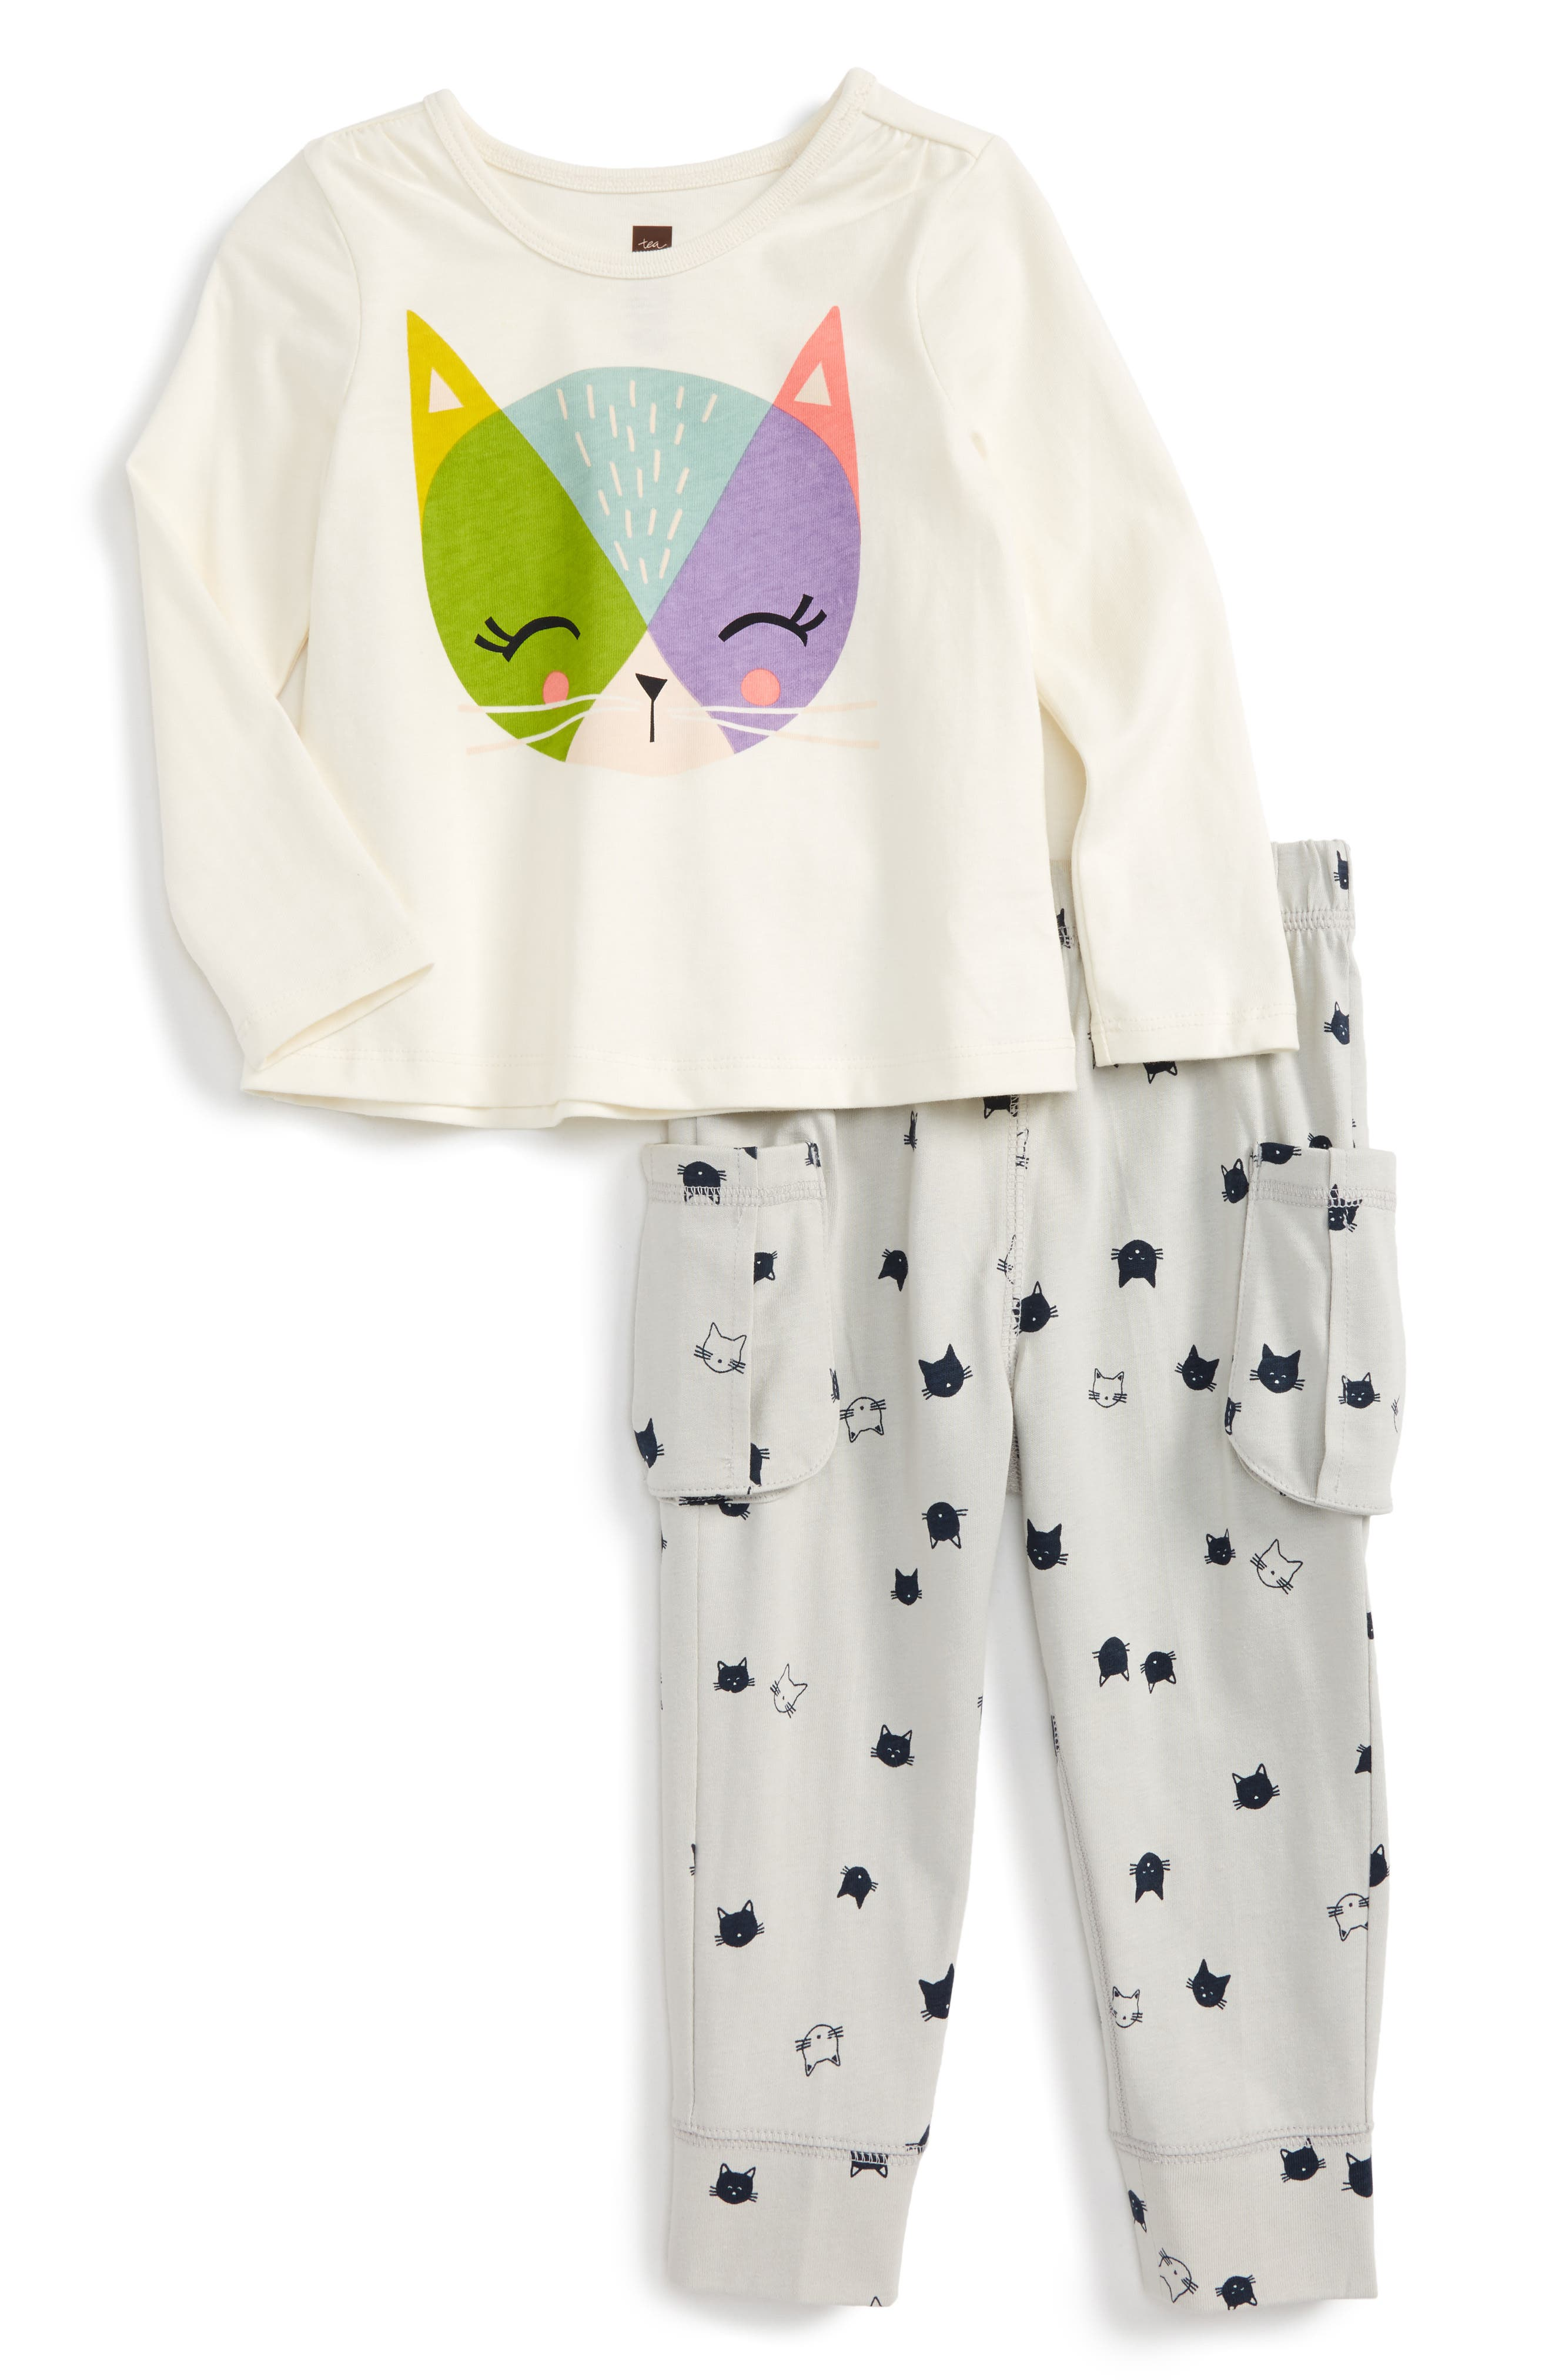 Hamish McHamish Graphic Top & Sweatpants,                         Main,                         color, 903